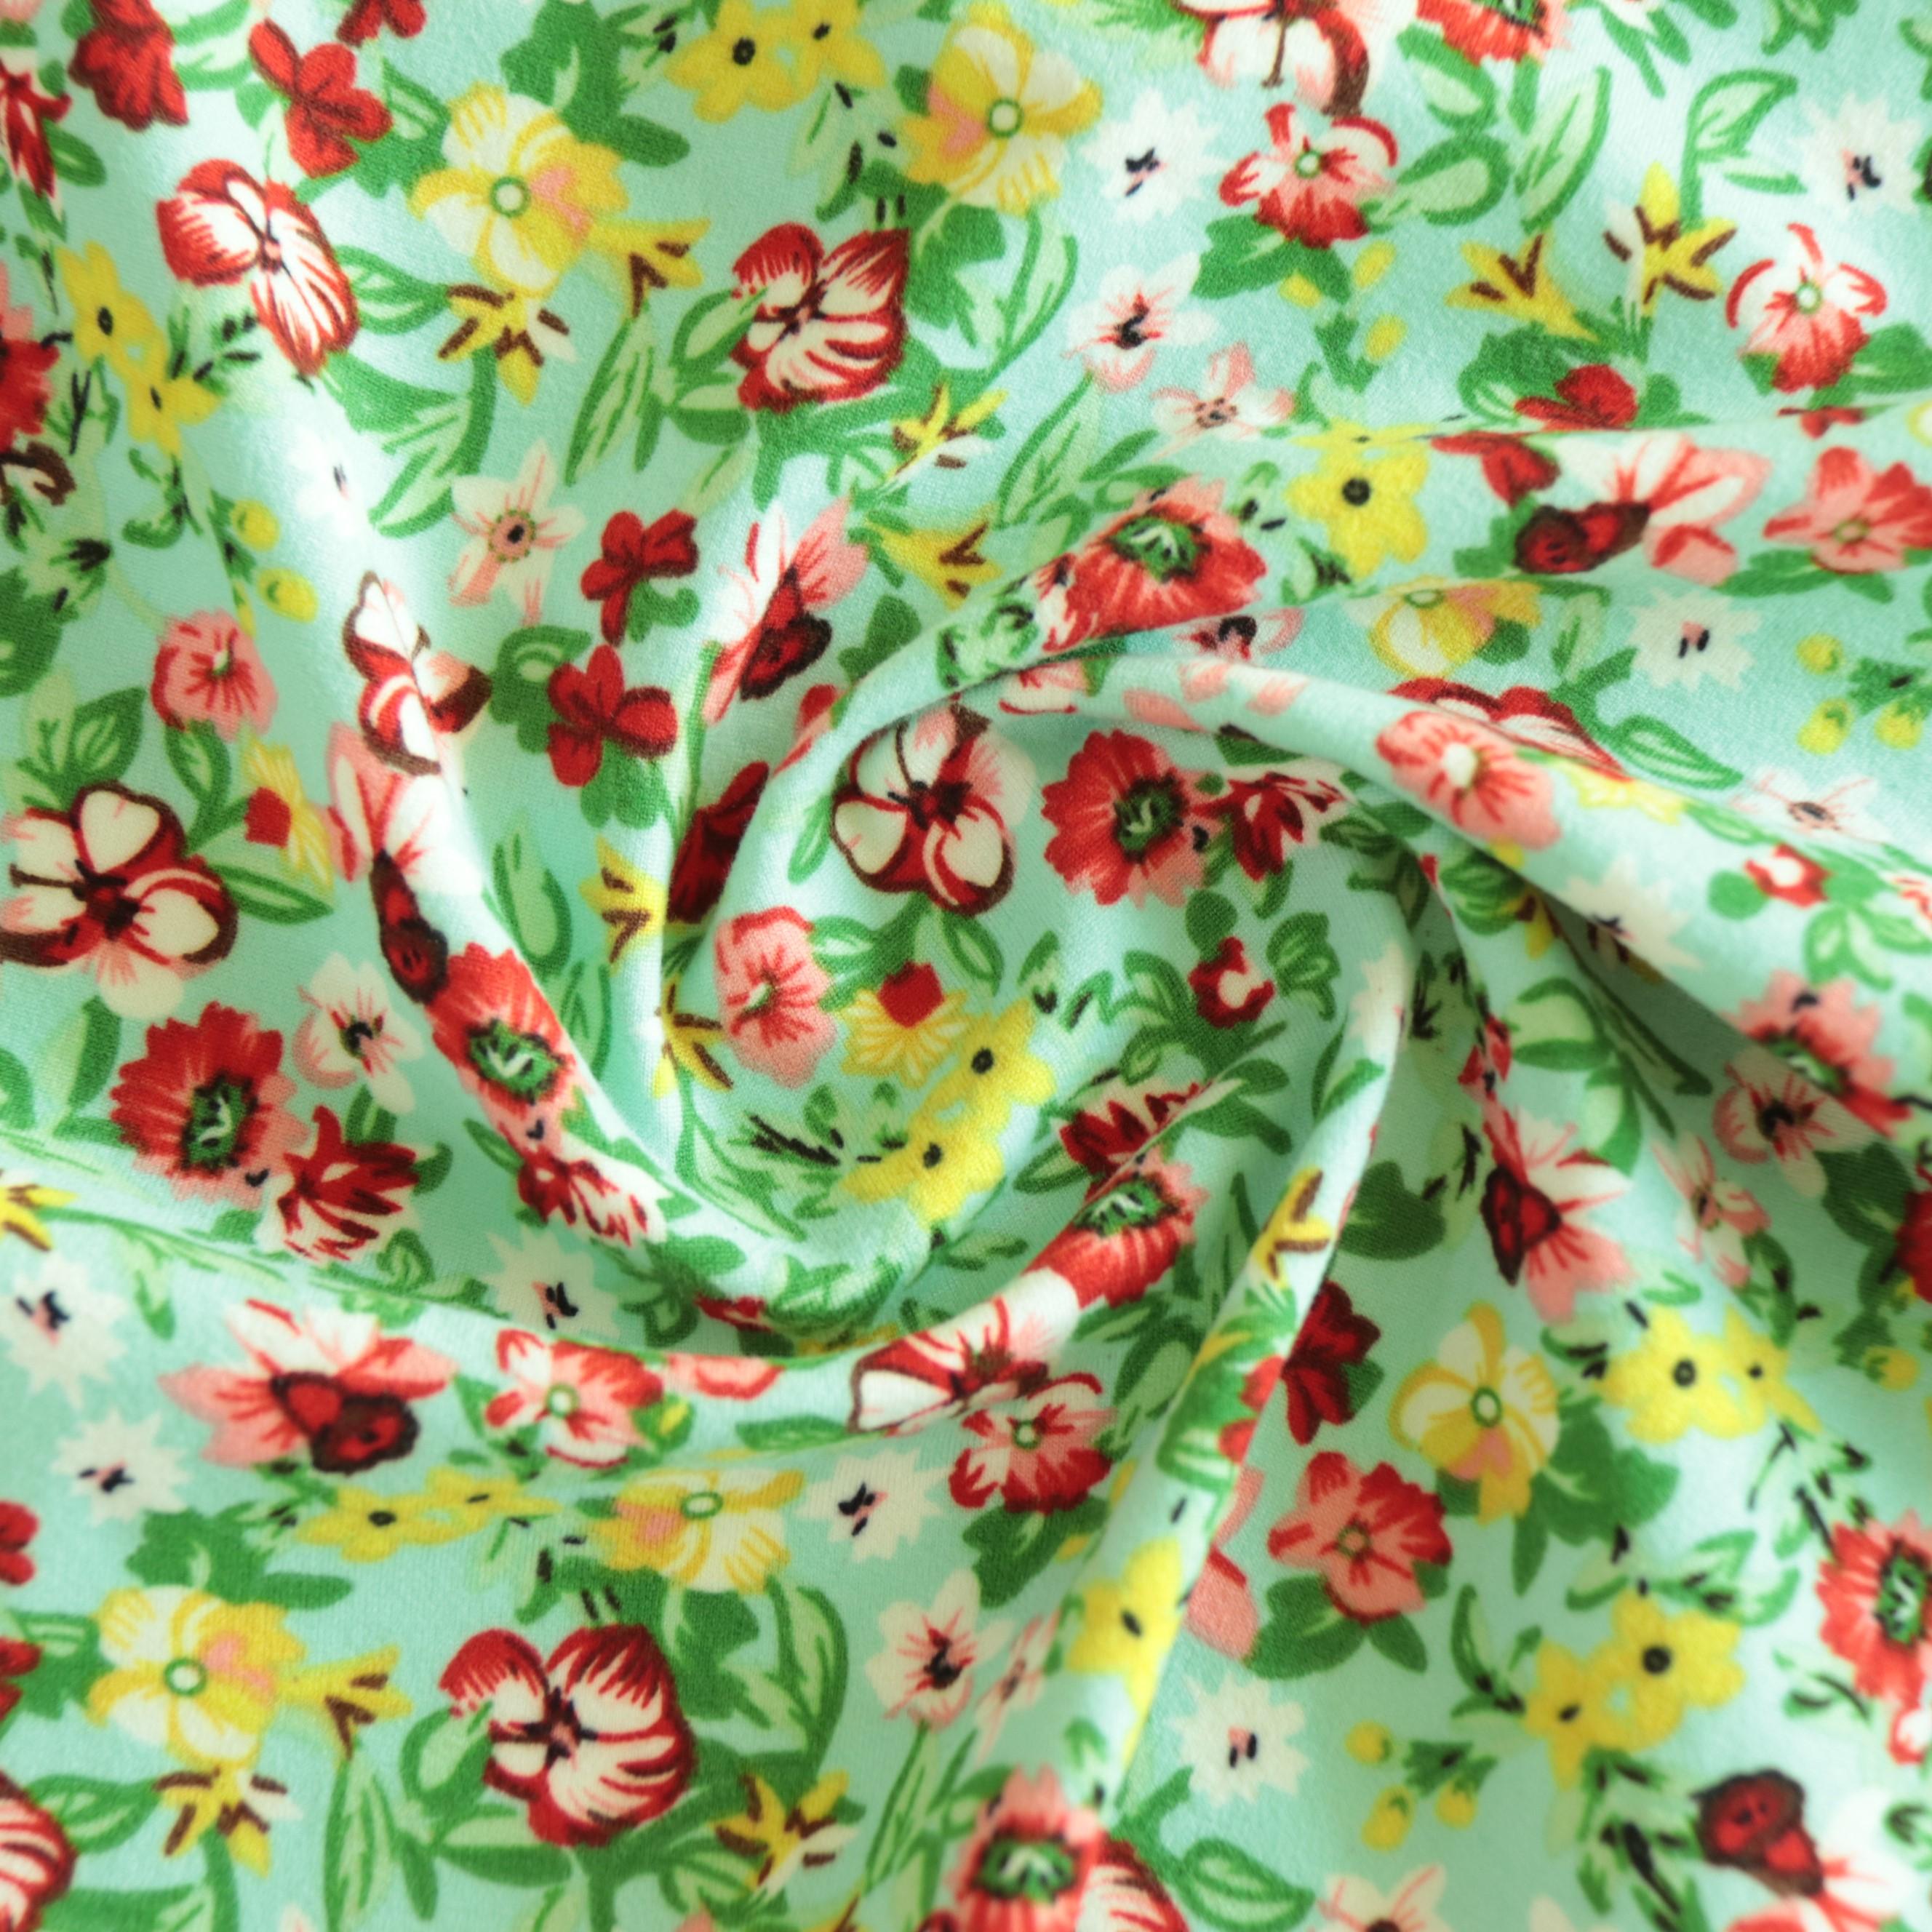 NO MOQ Customized 96% polyester 4% spandex Broken flower DTY 2 side jersey Brush digital print dye stretch fabric